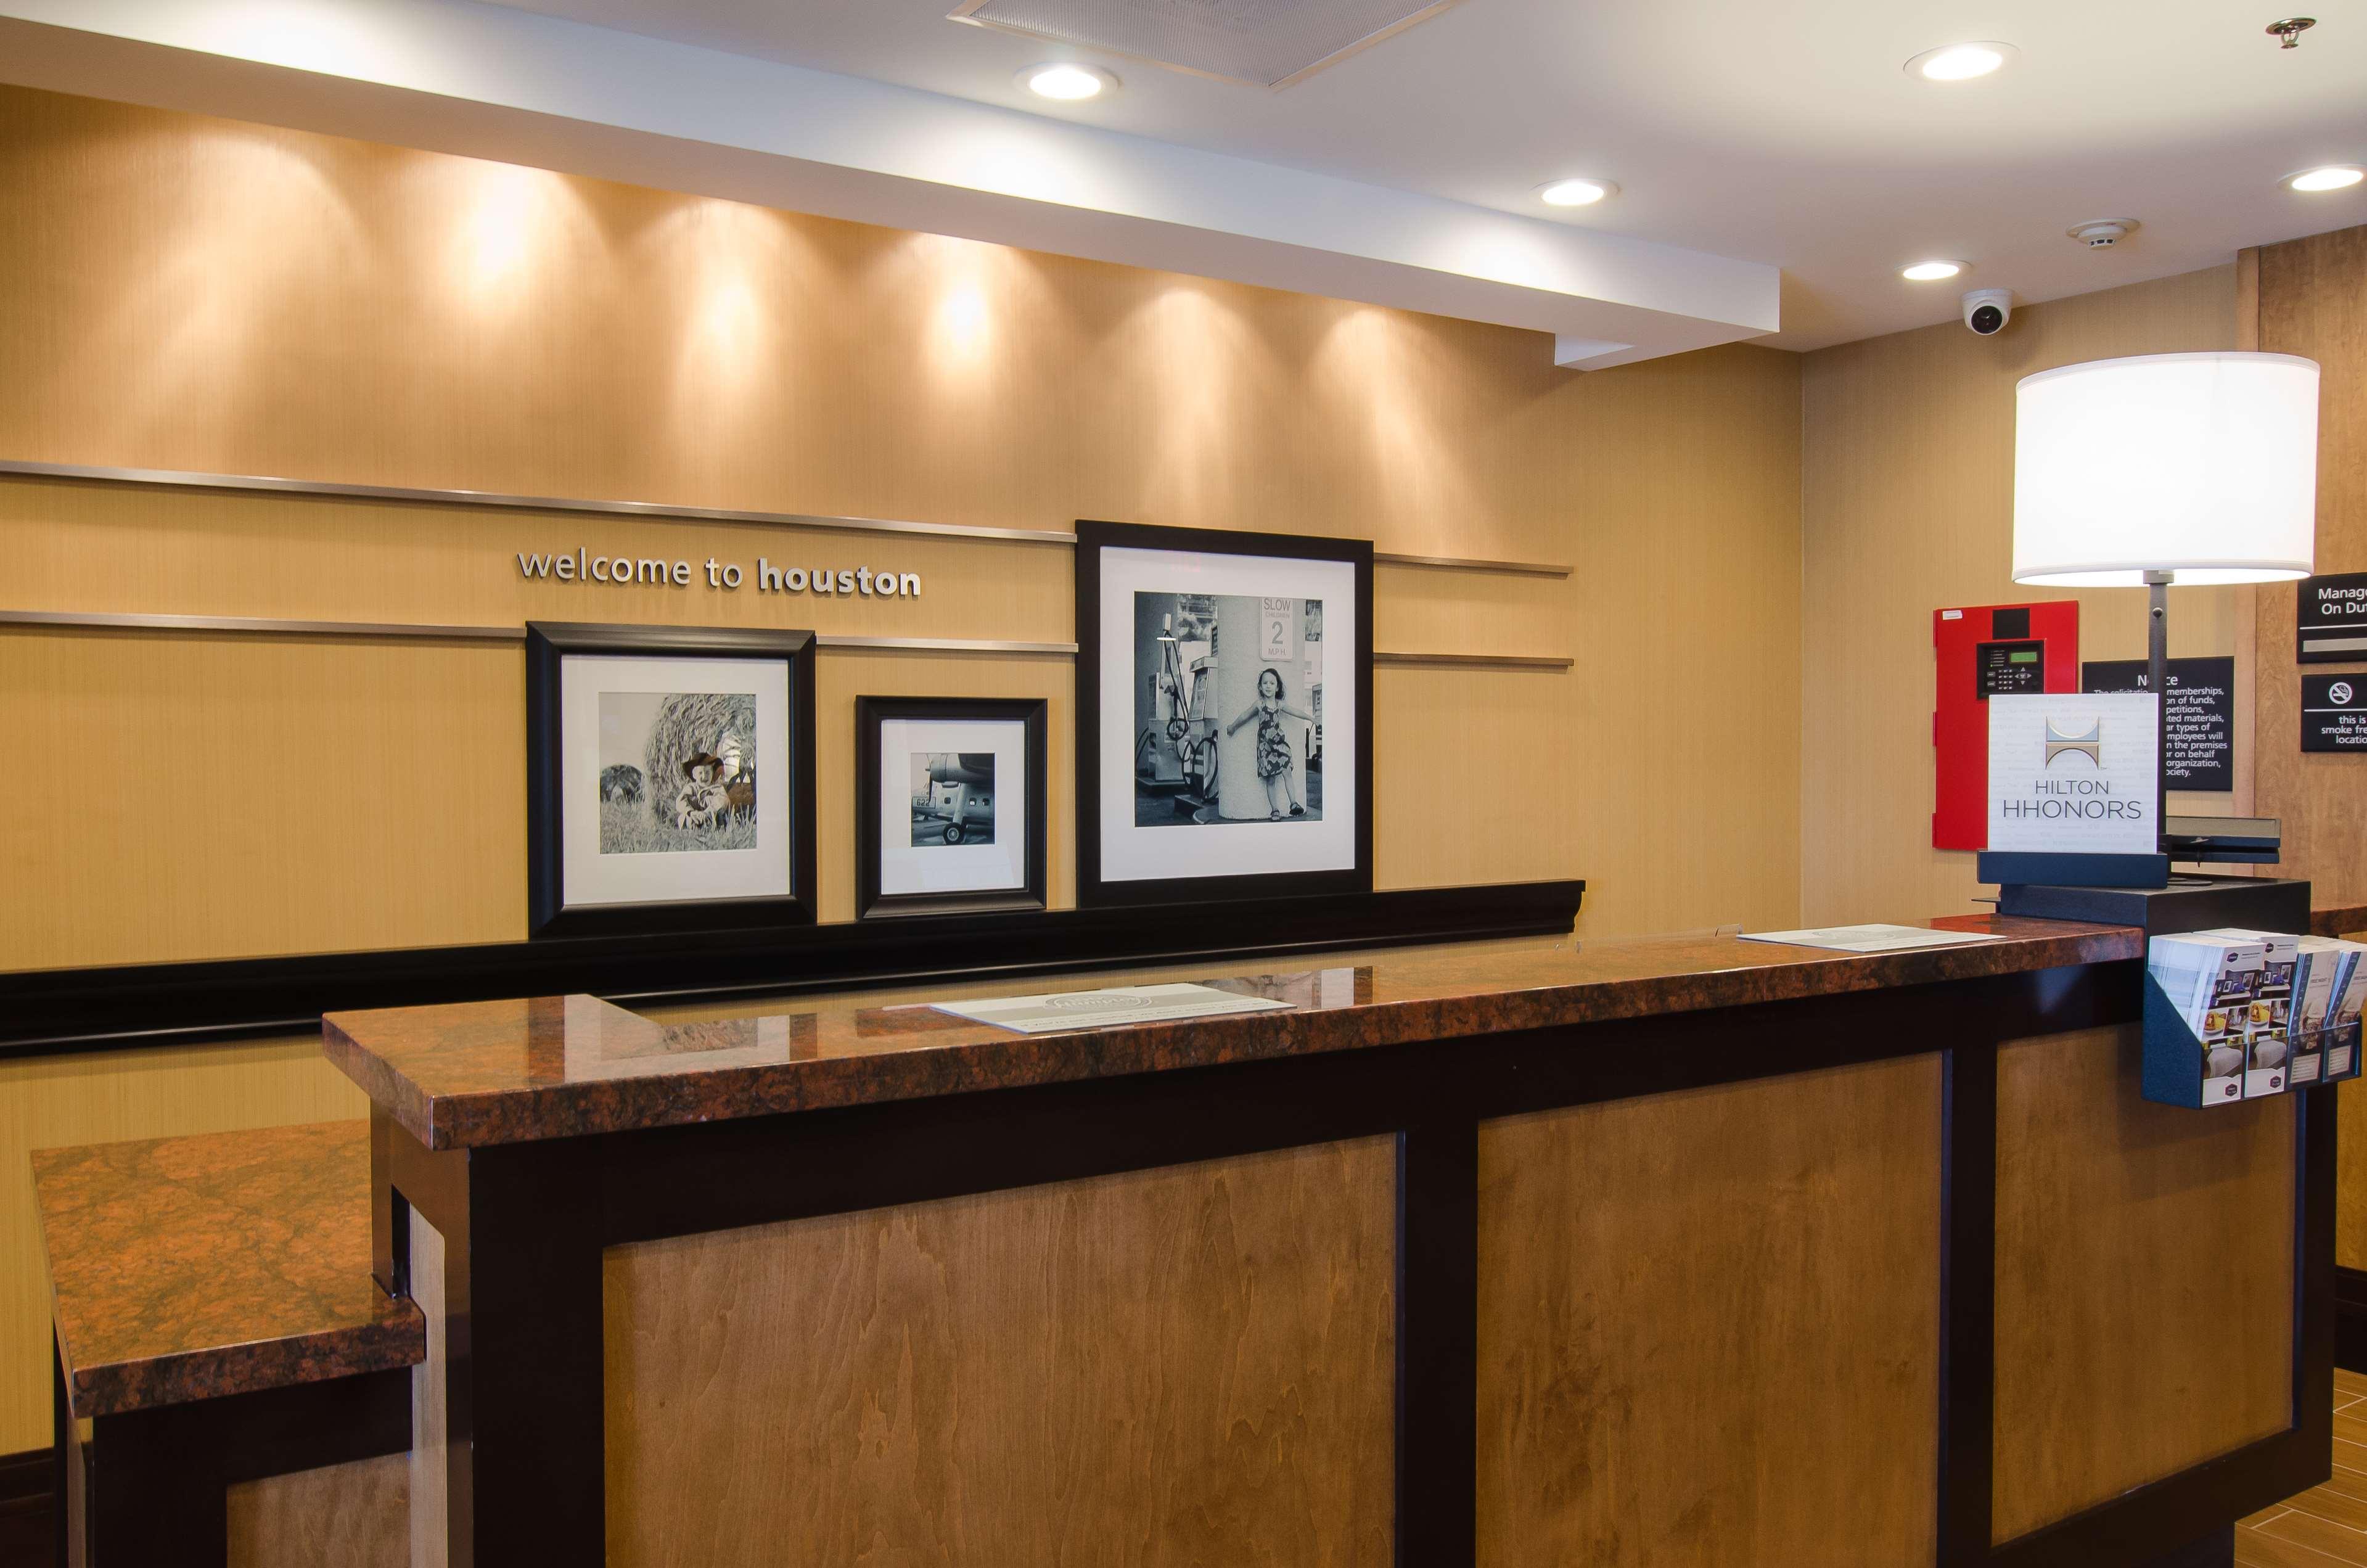 Hampton Inn & Suites Houston North IAH image 4